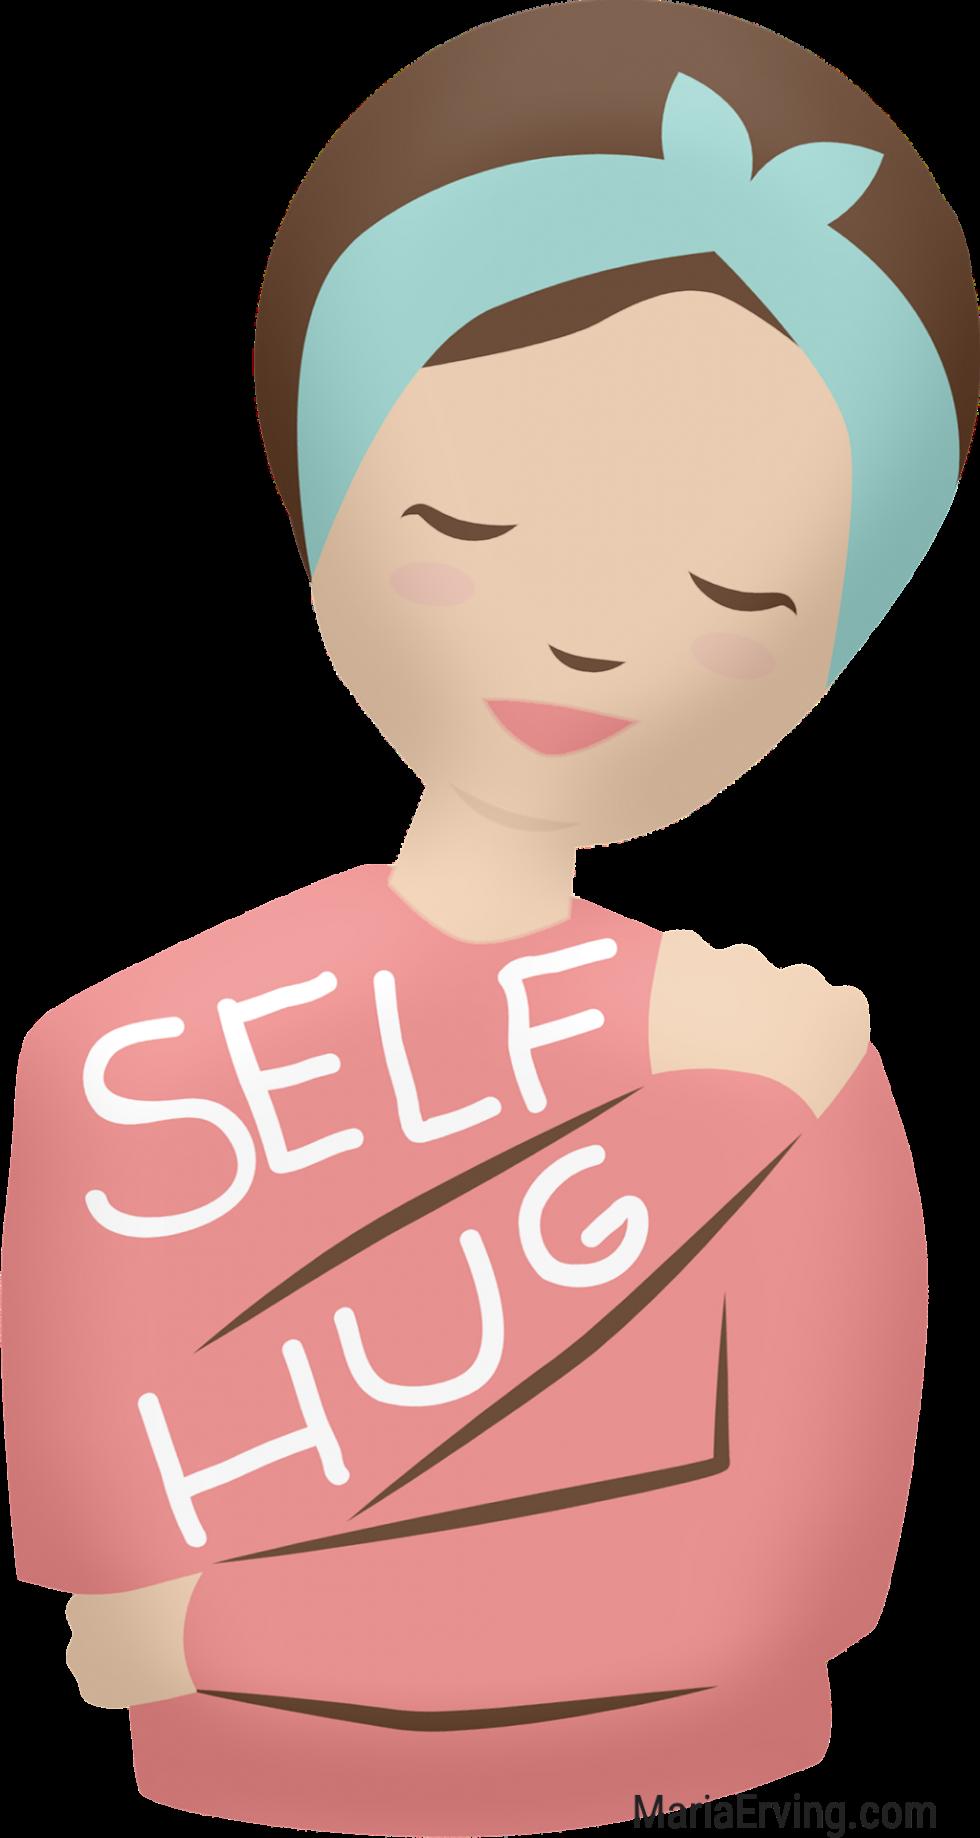 self-hug